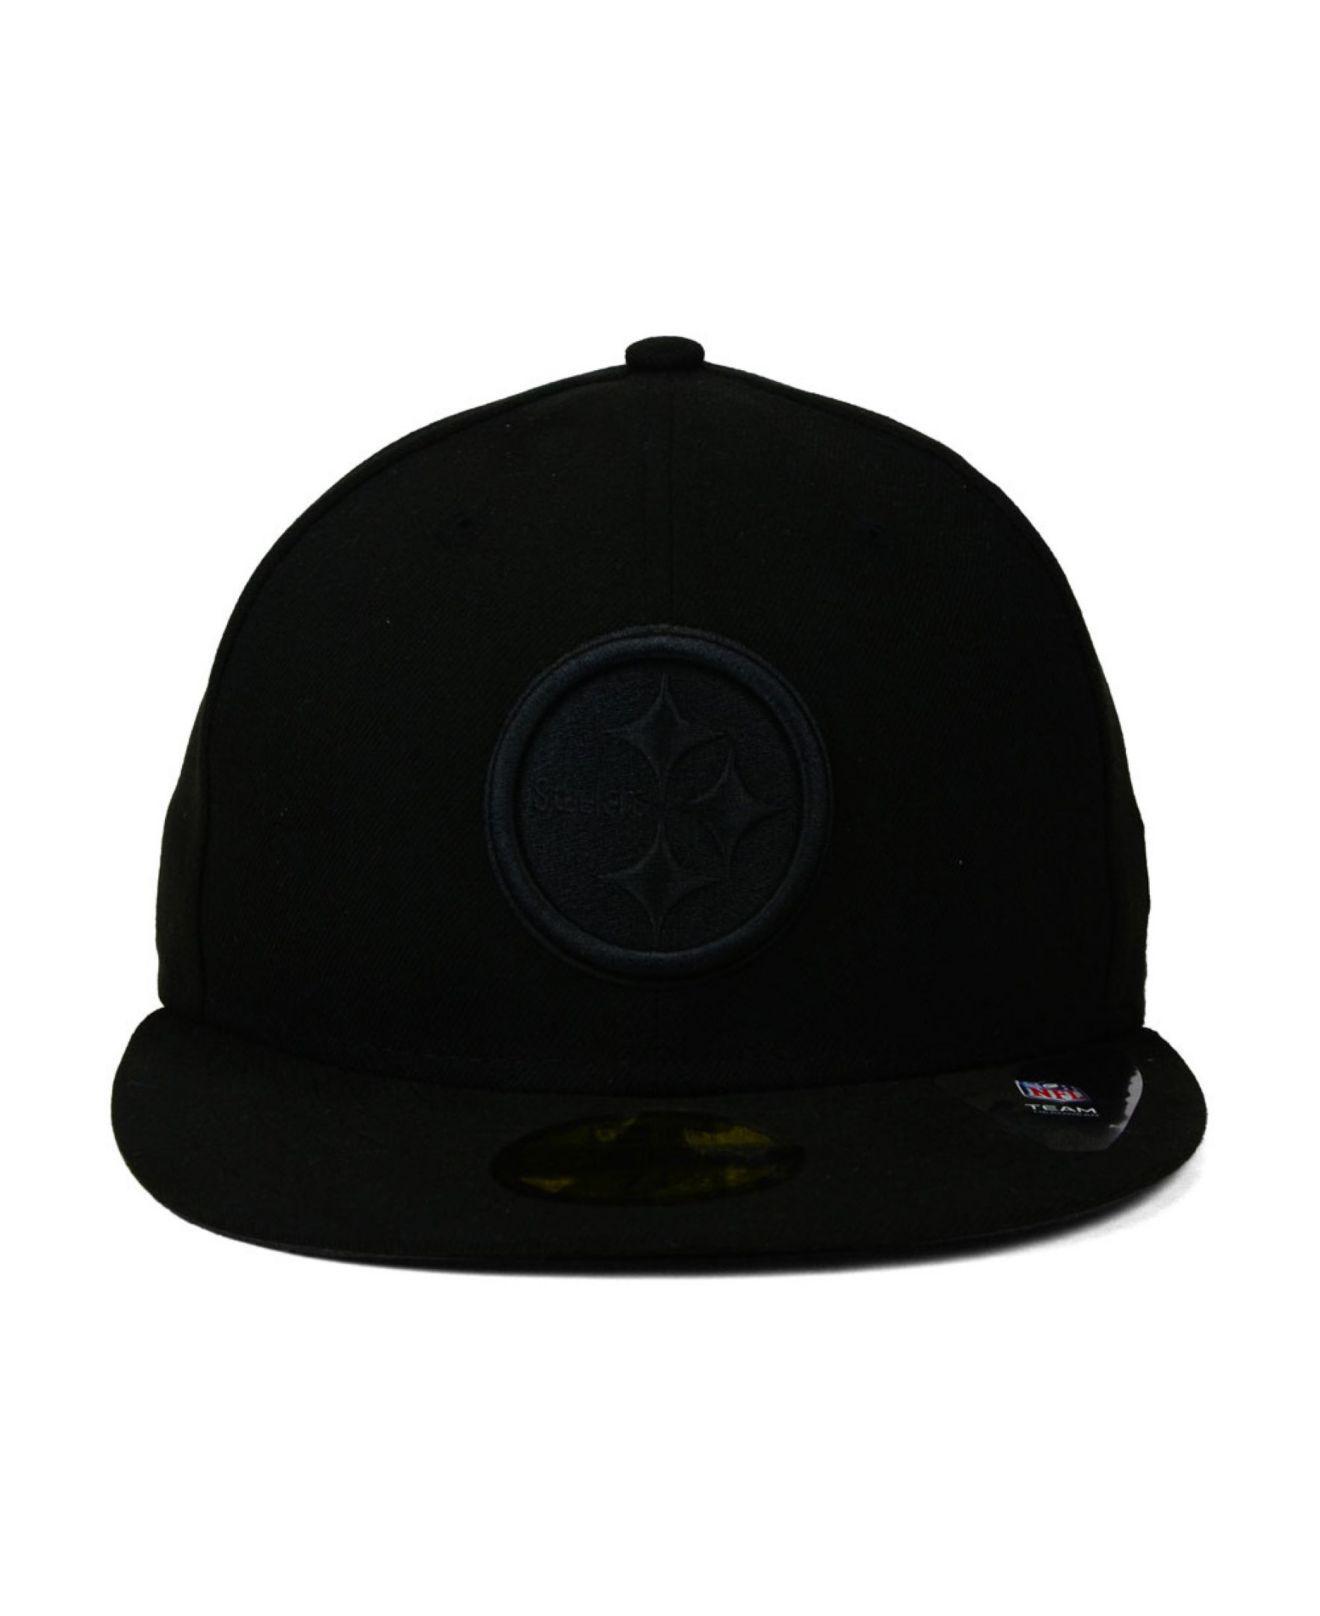 ... release date lyst ktz pittsburgh steelers black on black 59fifty cap in  black for men 11f5b f851029feb11